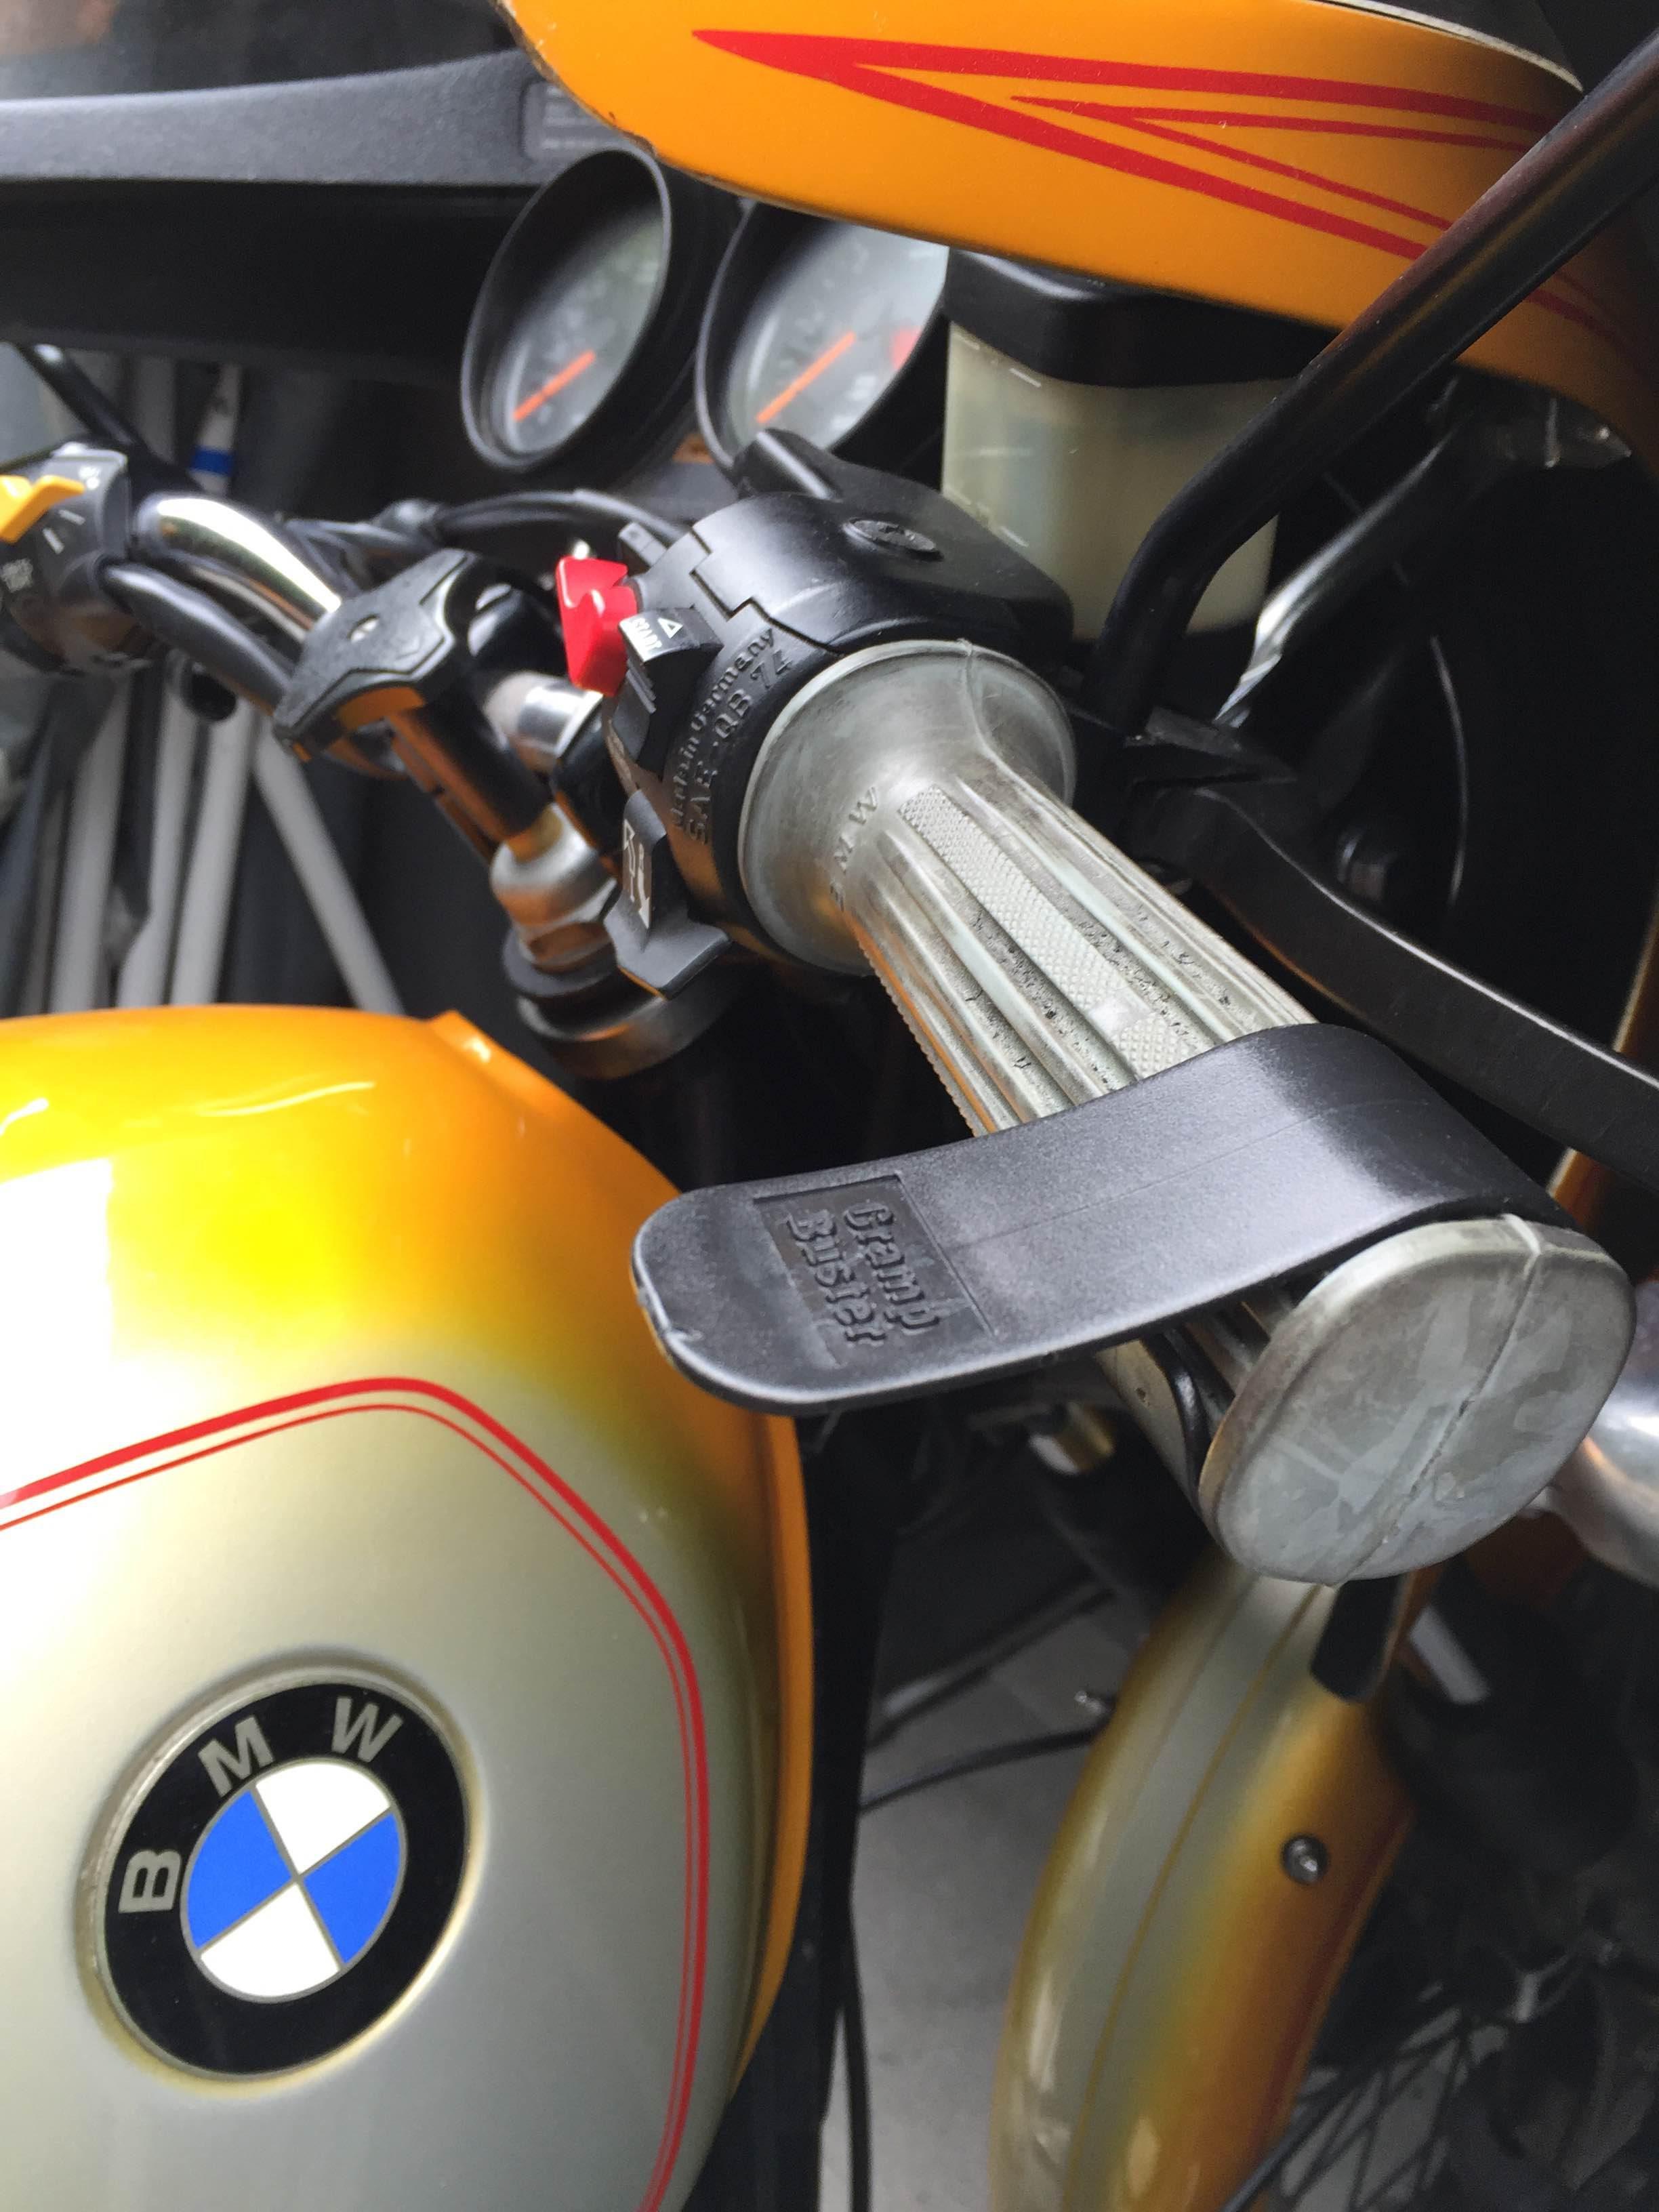 A cheap, simple fix for an achy throttle hand